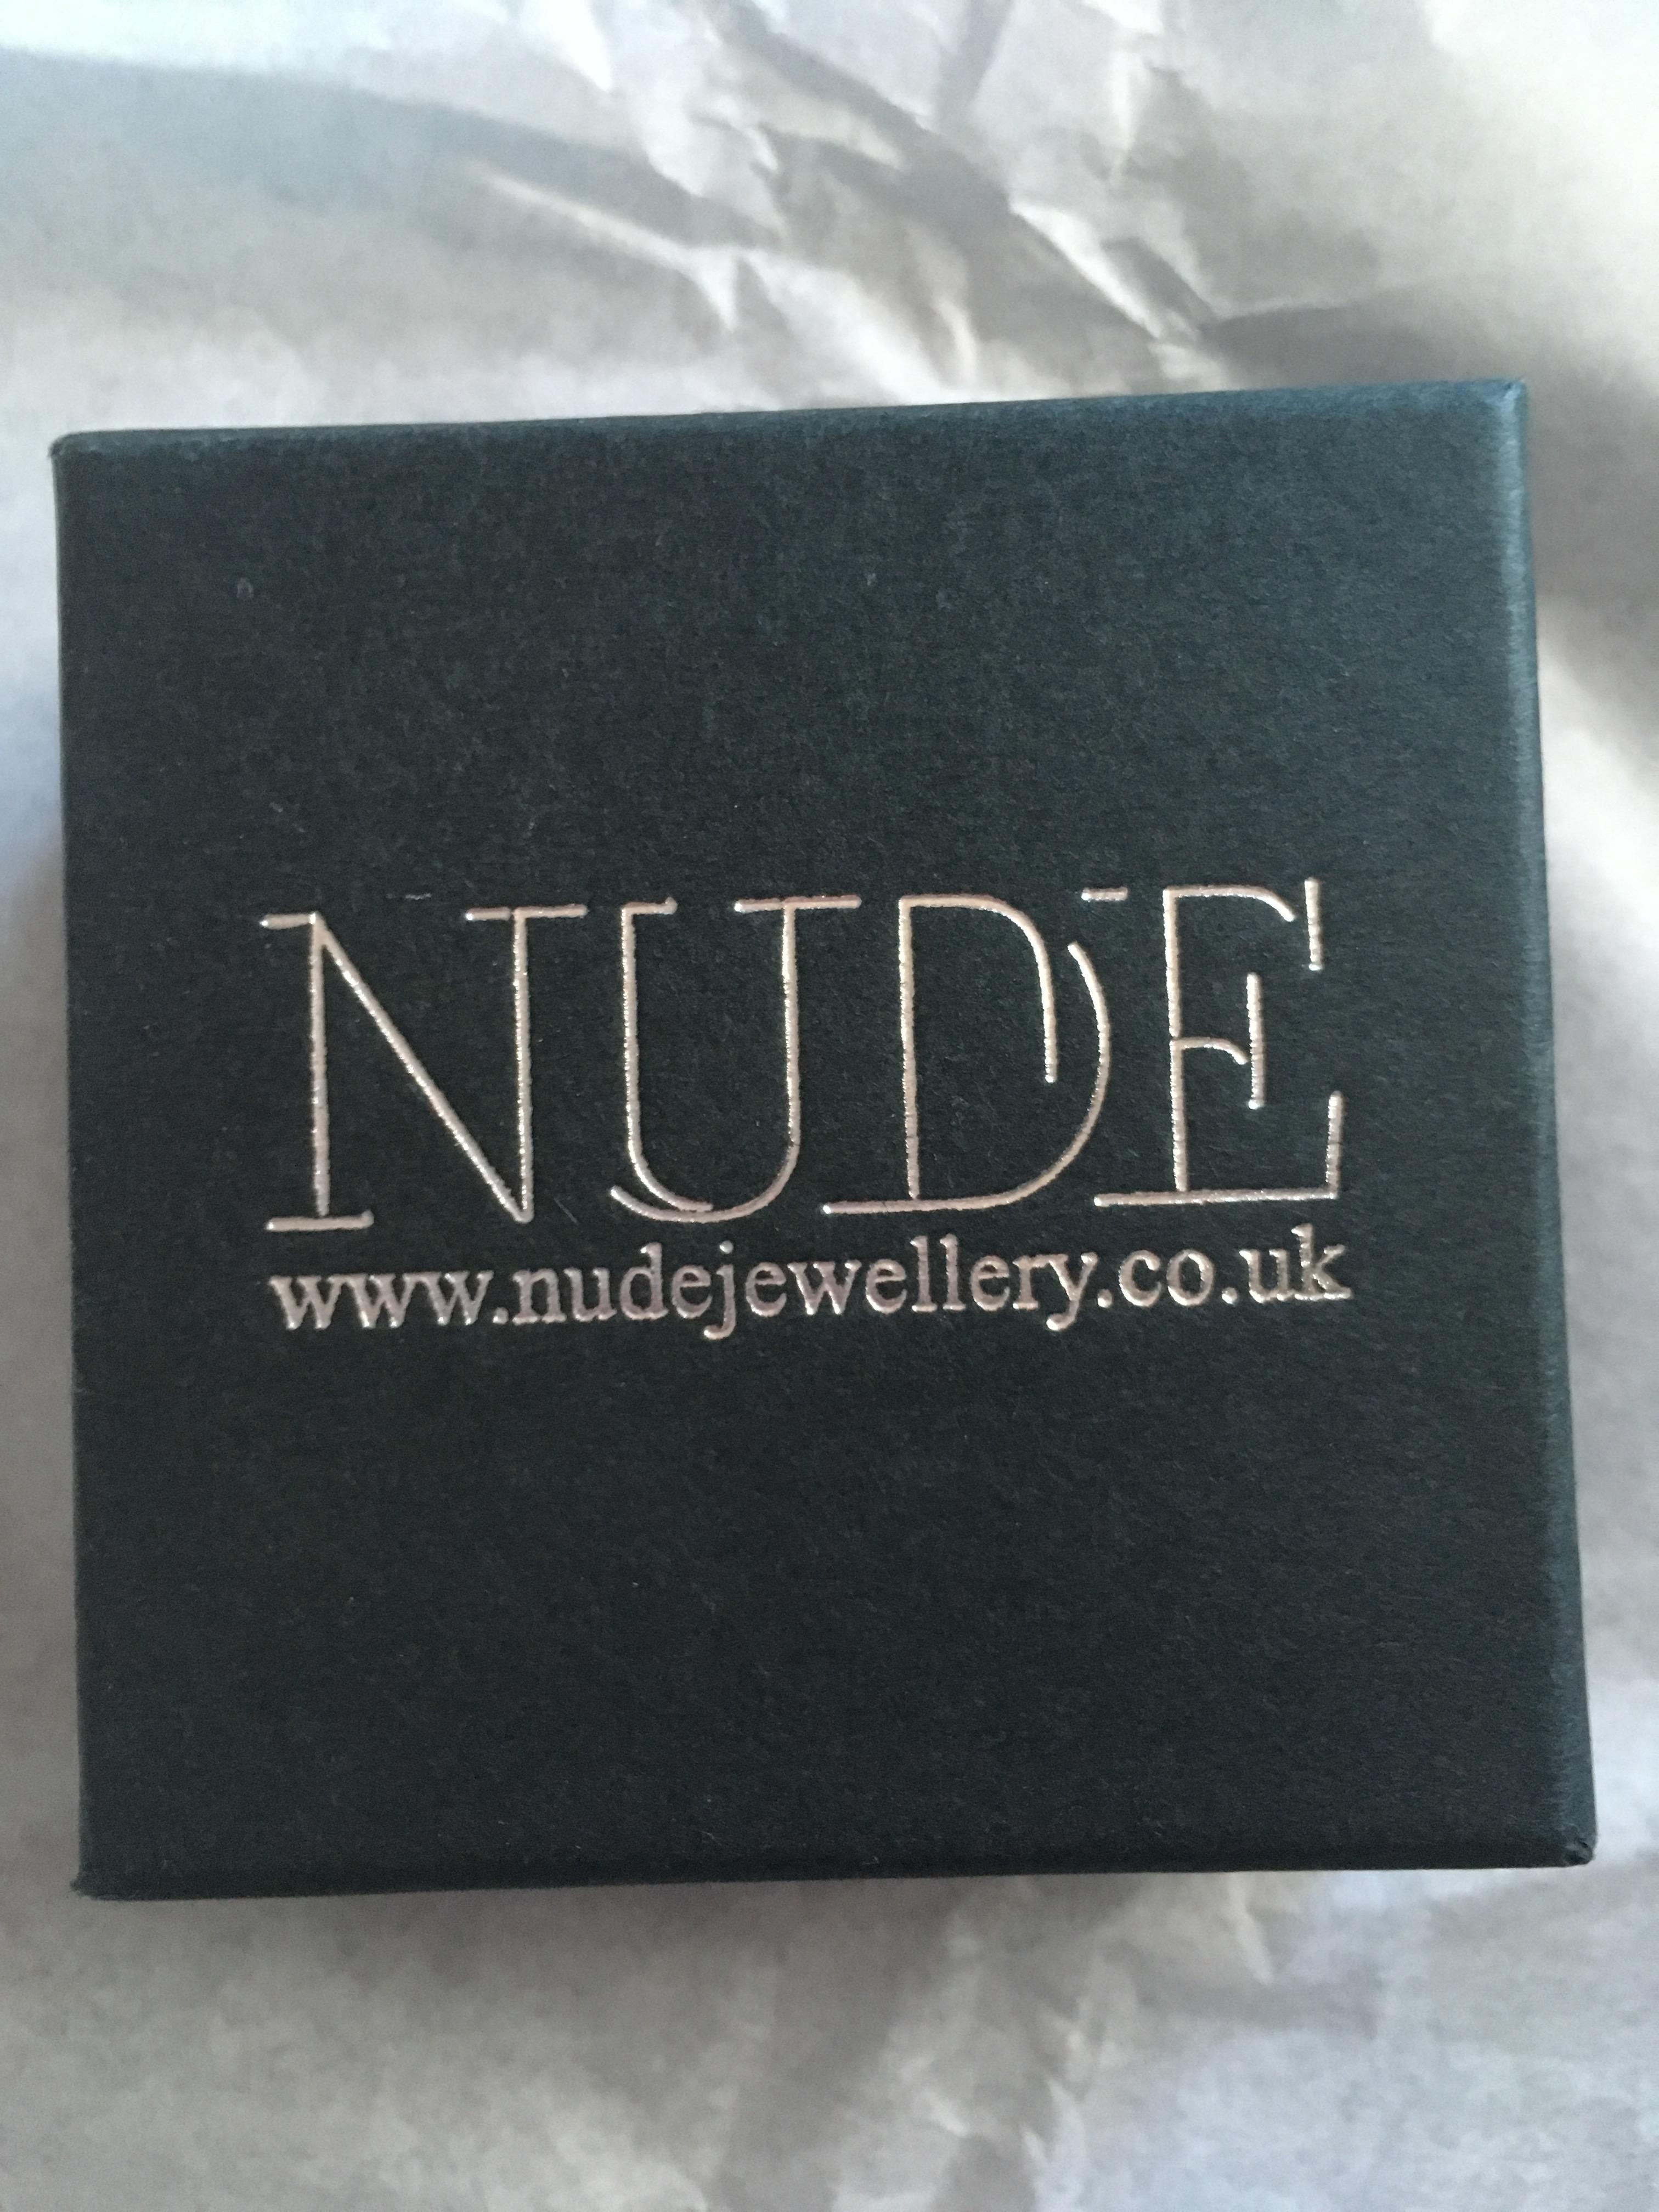 nude jewellery bespoke custom made engagement rings wedding